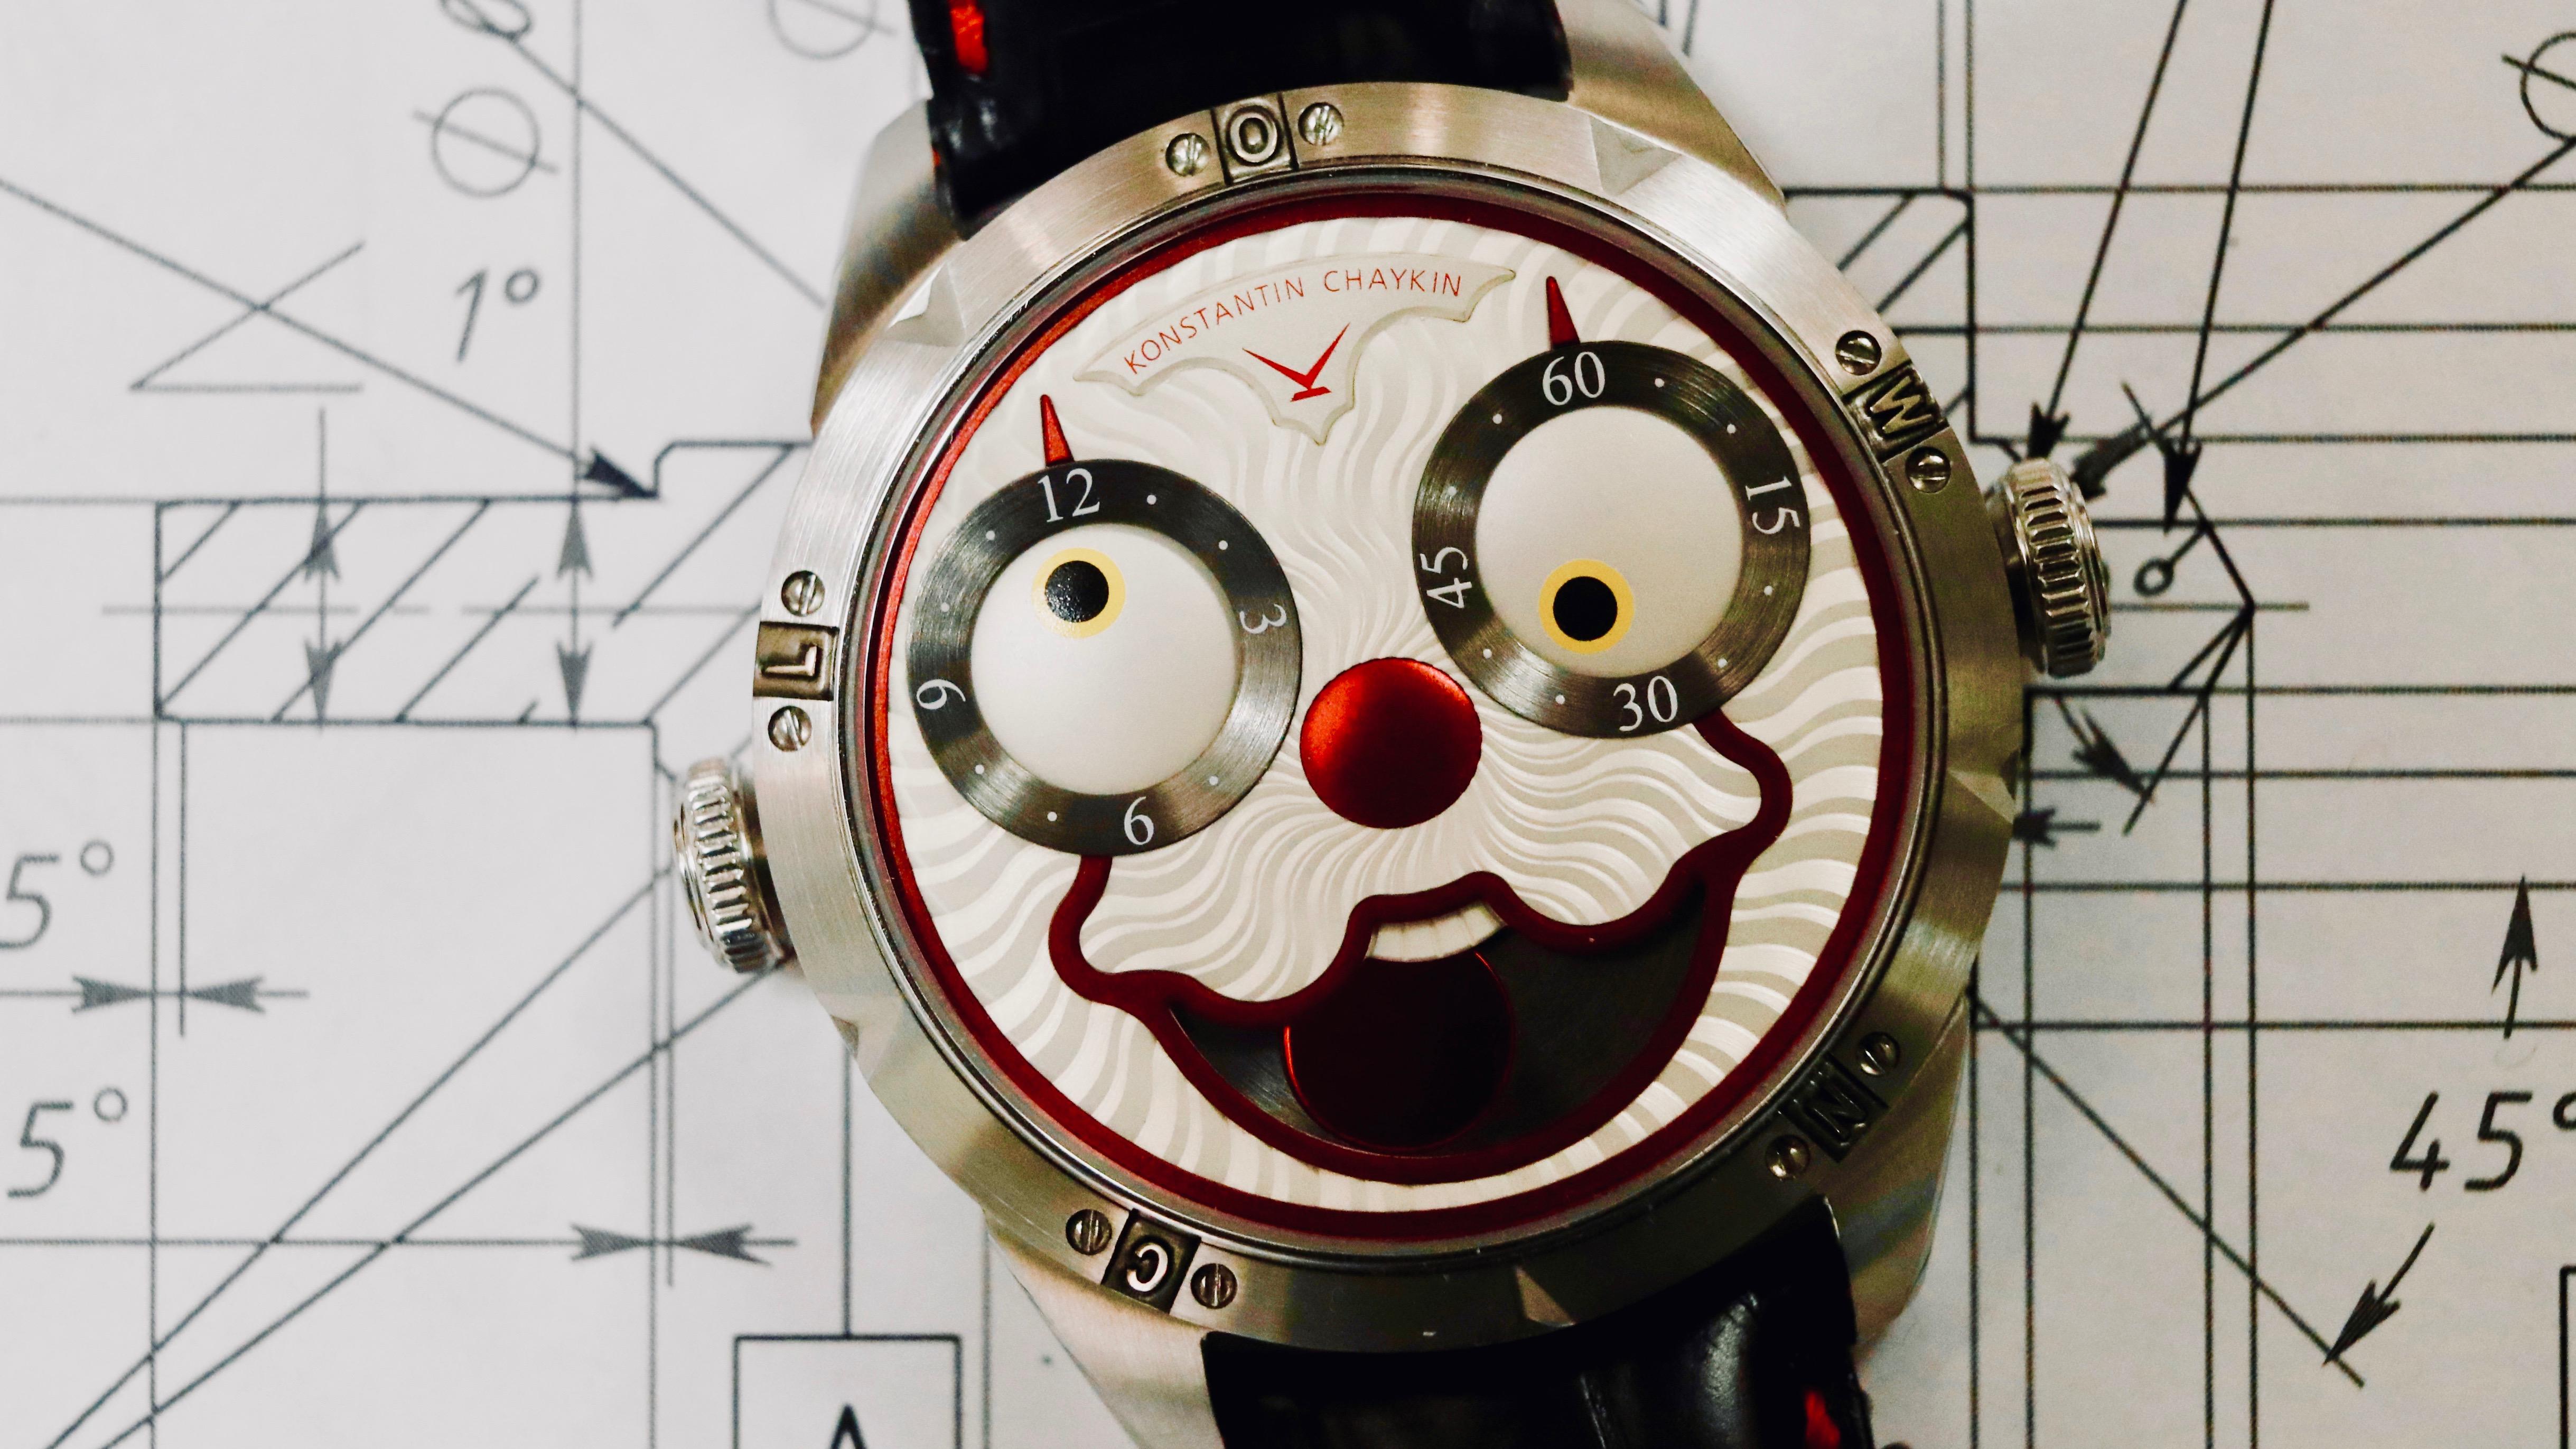 Clown watch.